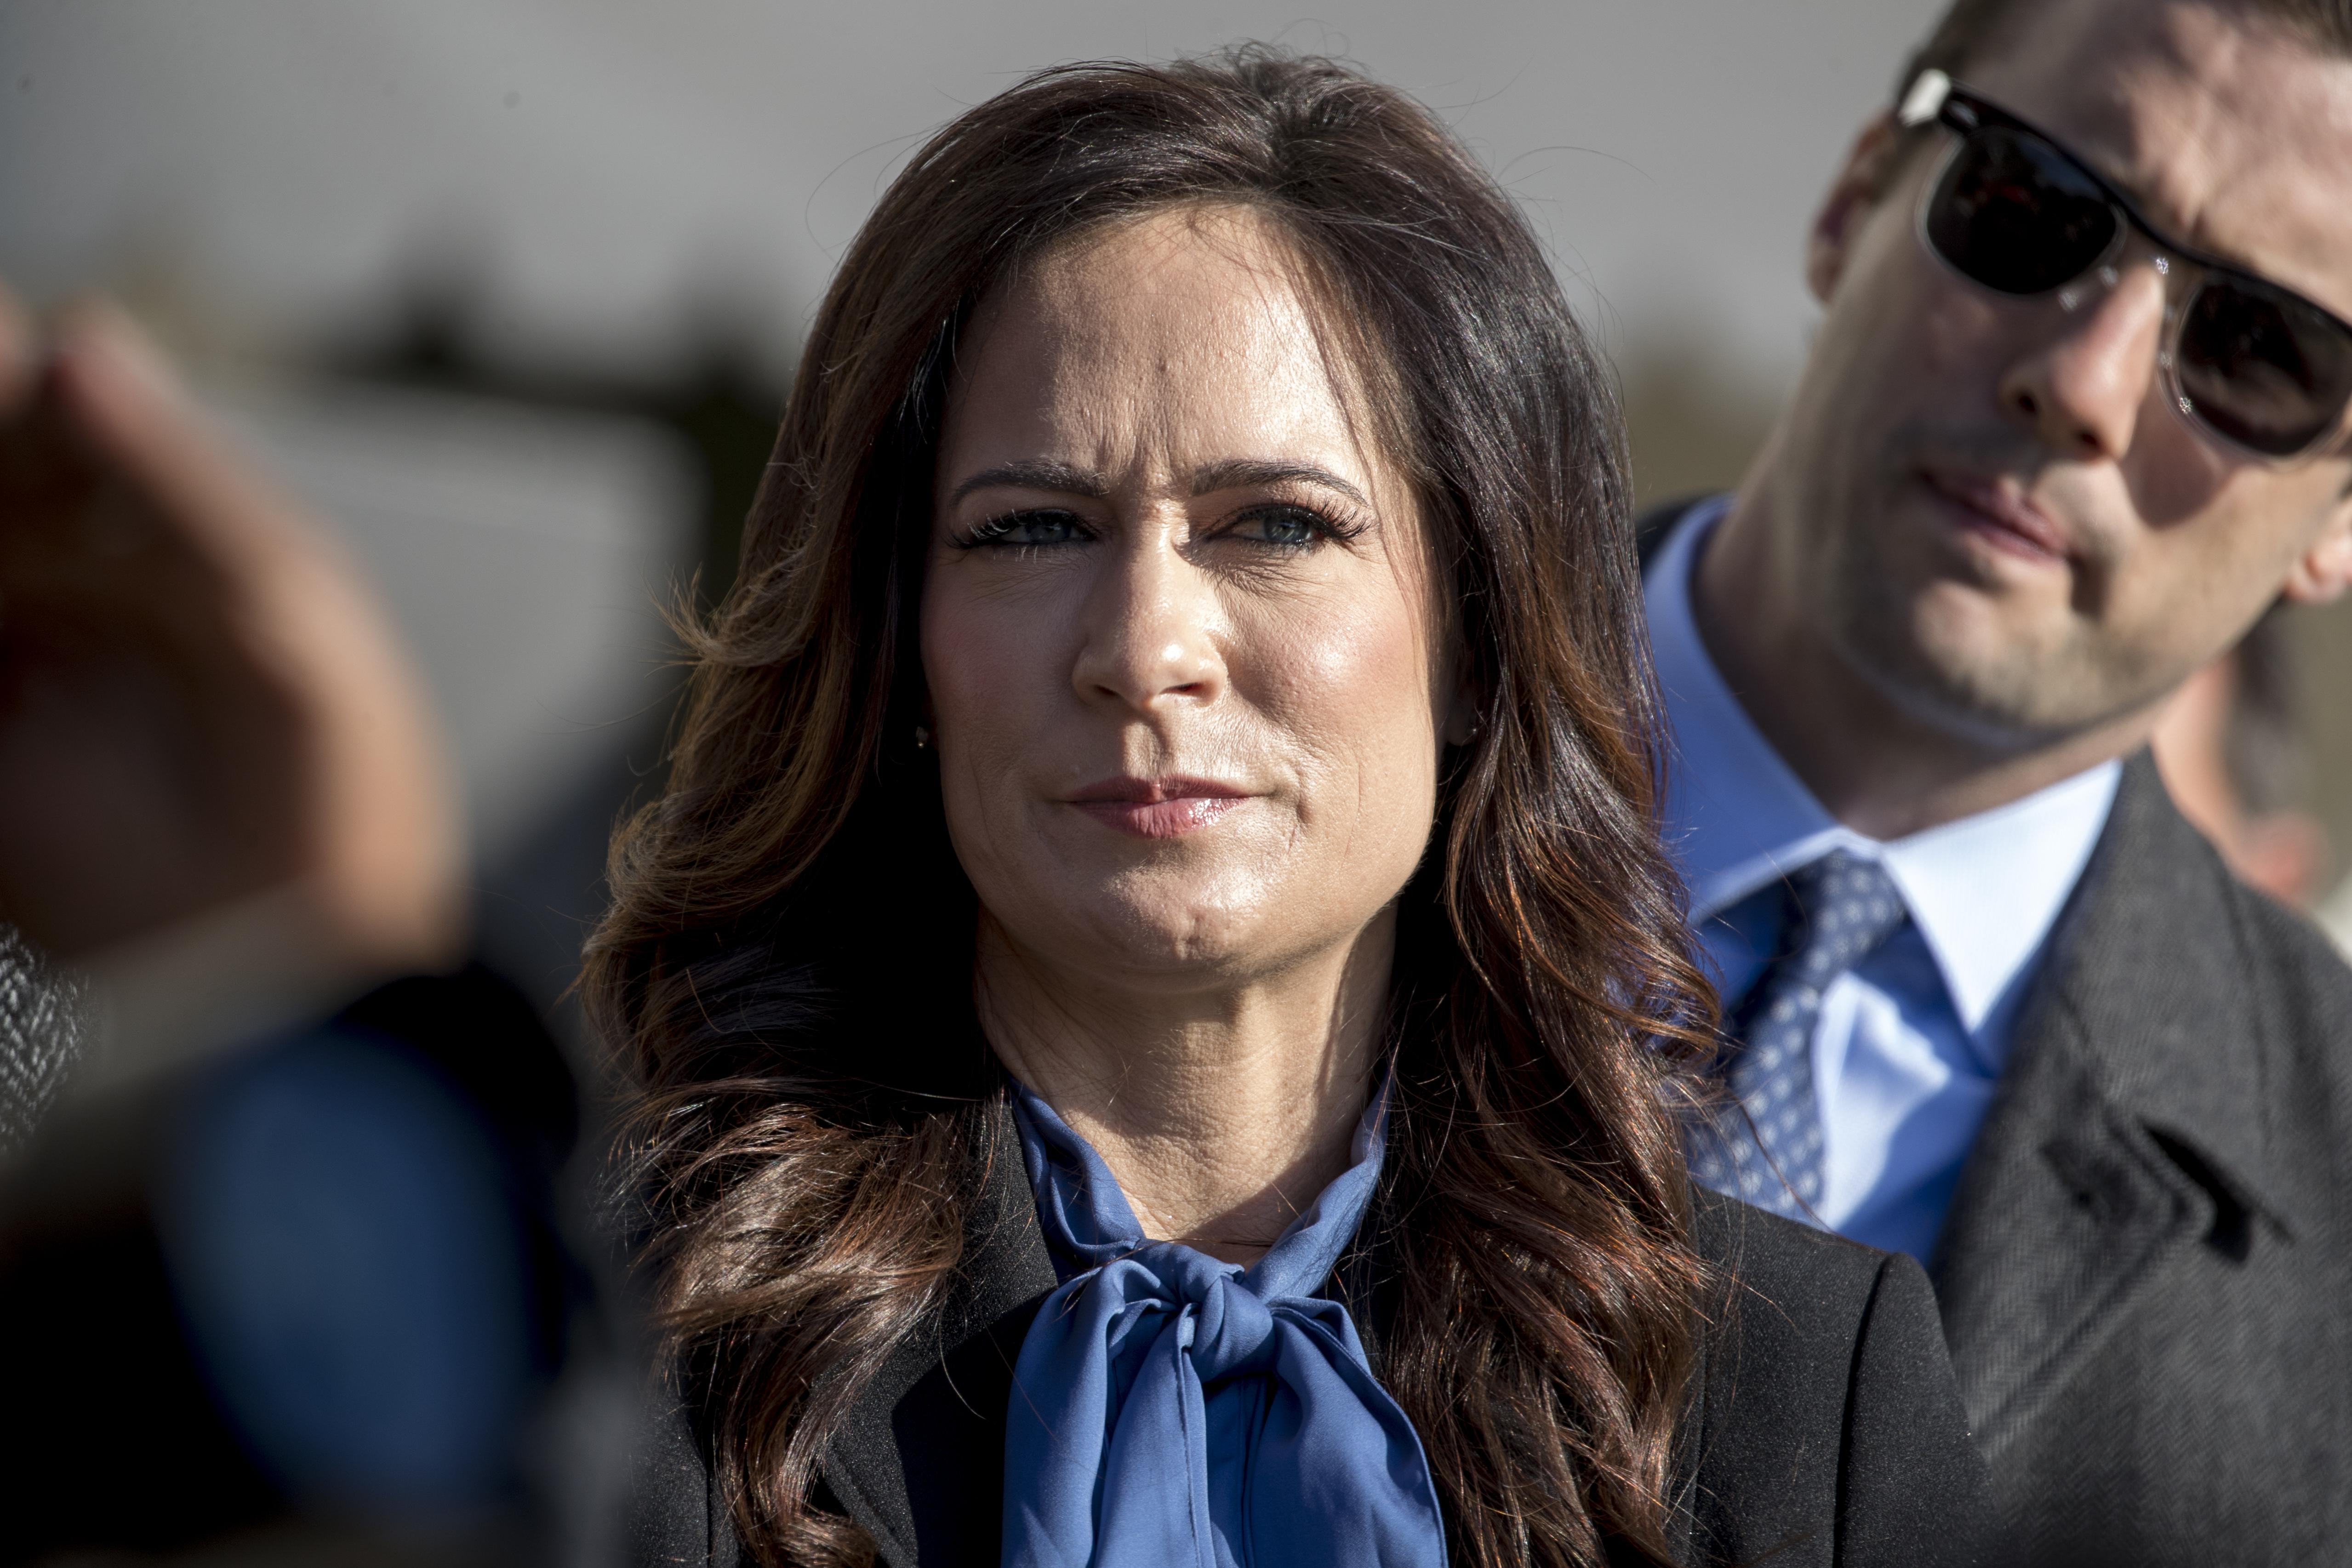 Stephanie Grisham: Adam Schiff having 'mental issue,' is 'obsessed' with Trump